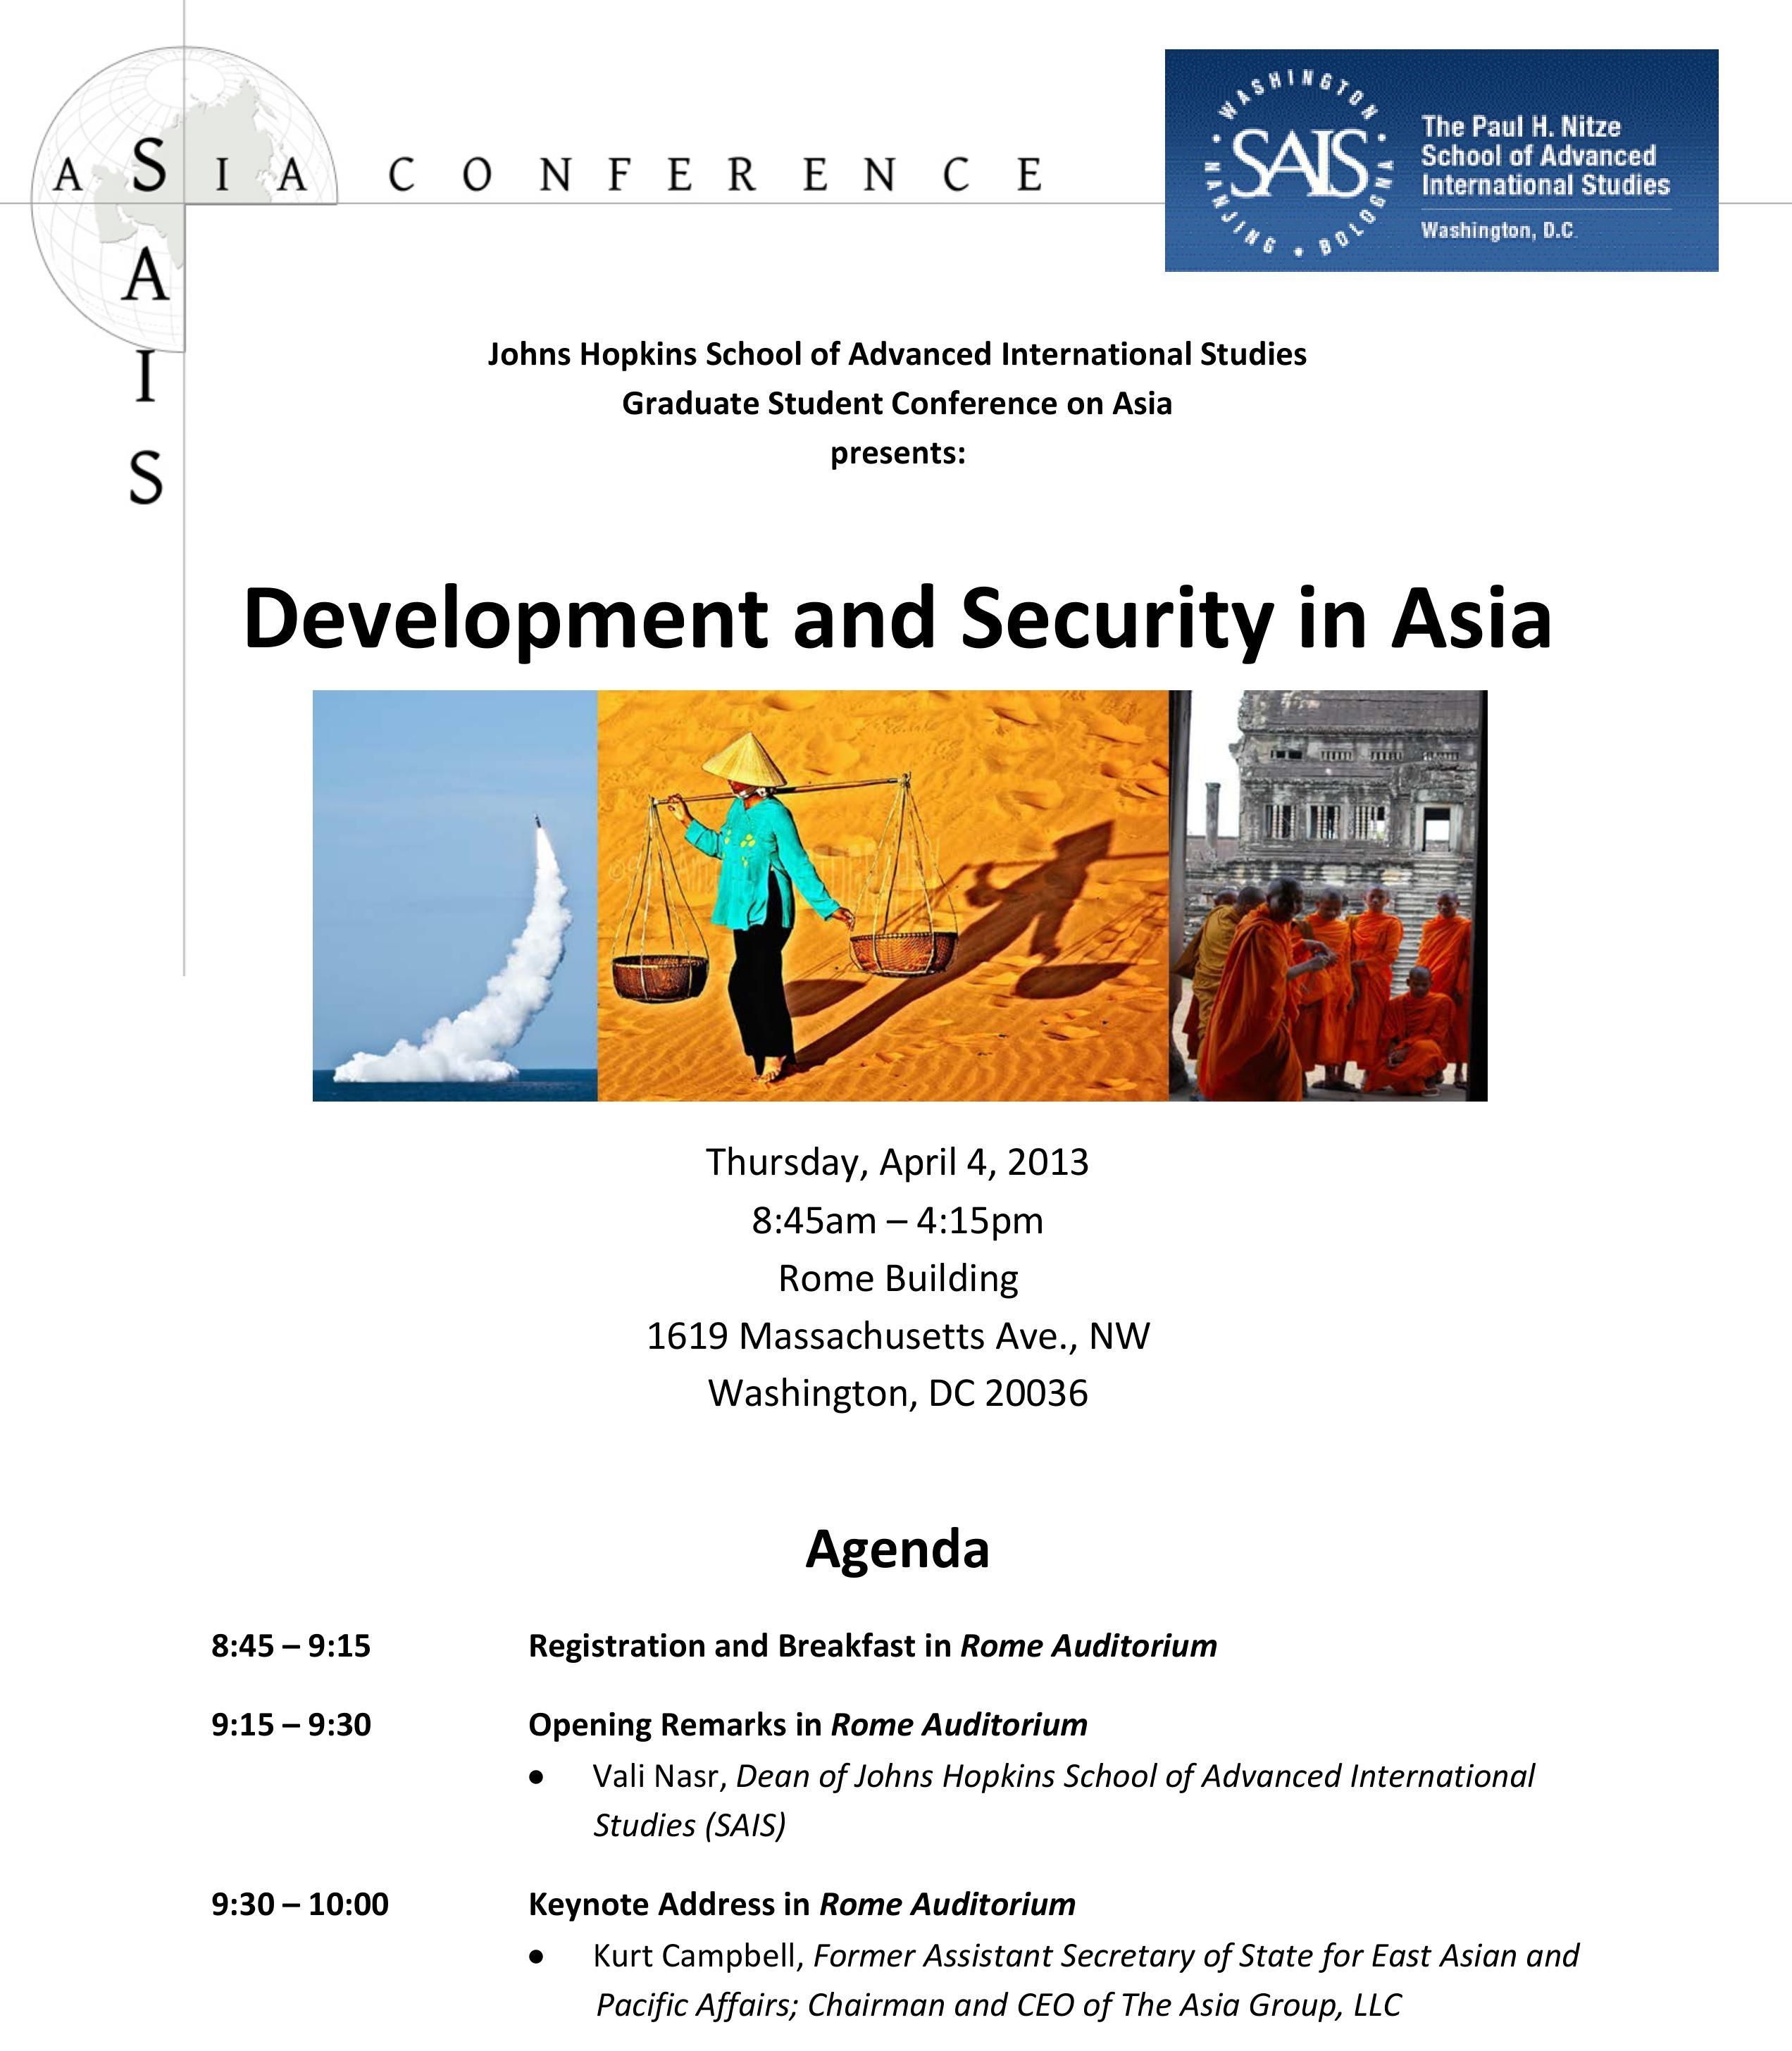 2013 Conference Agenda – The 2018 SAIS Asia Conference